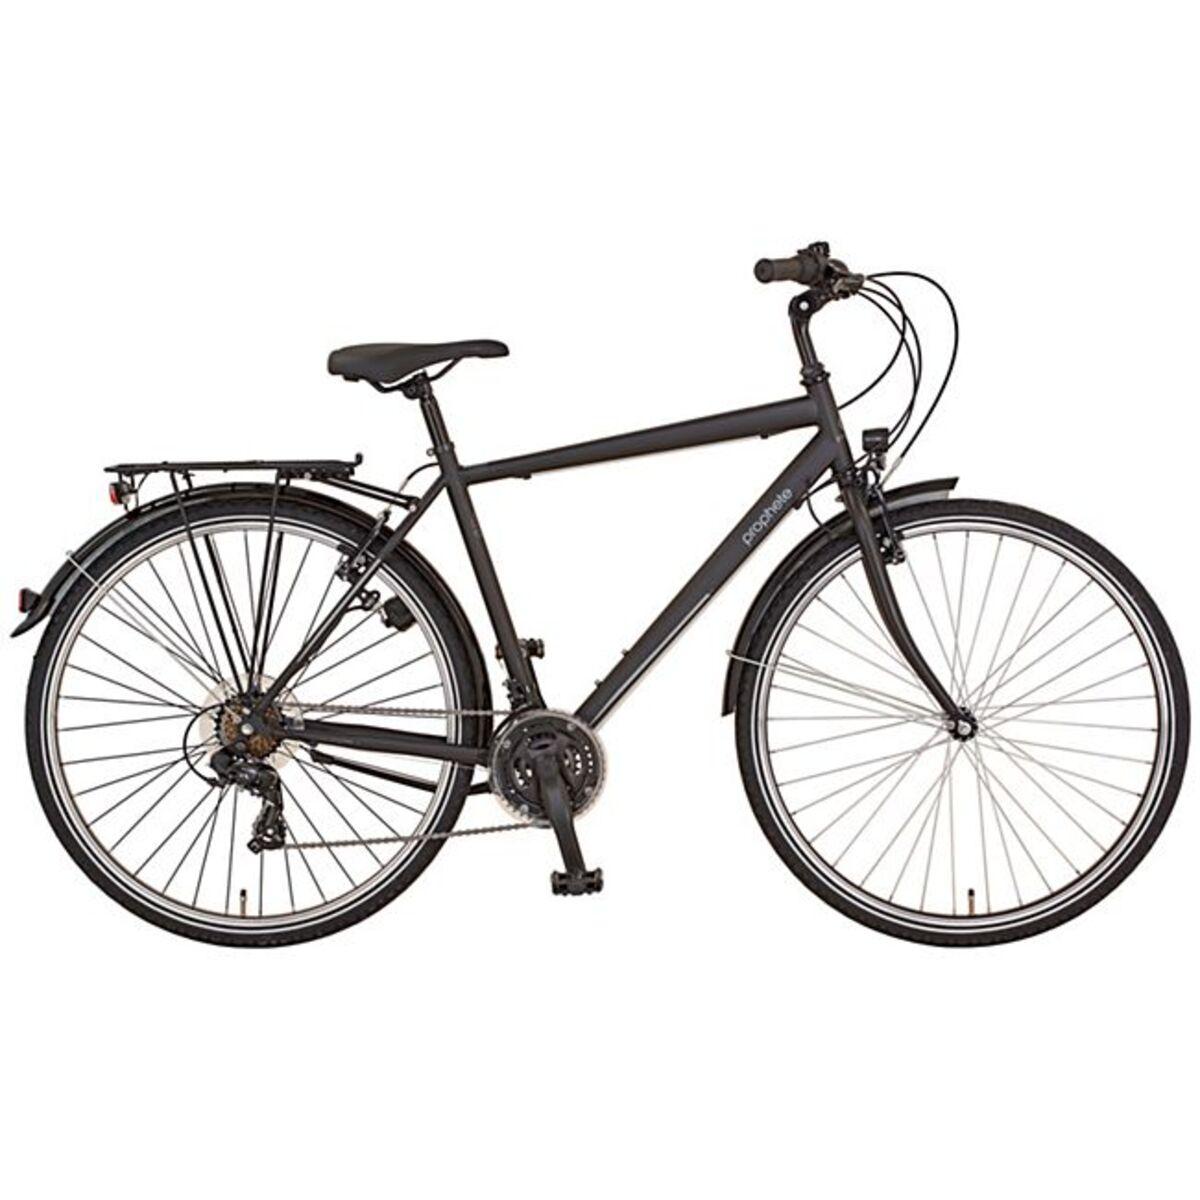 "Bild 1 von PROPHETE ENTDECKER 20.BST.10 28"" Herren Trekking Bike"